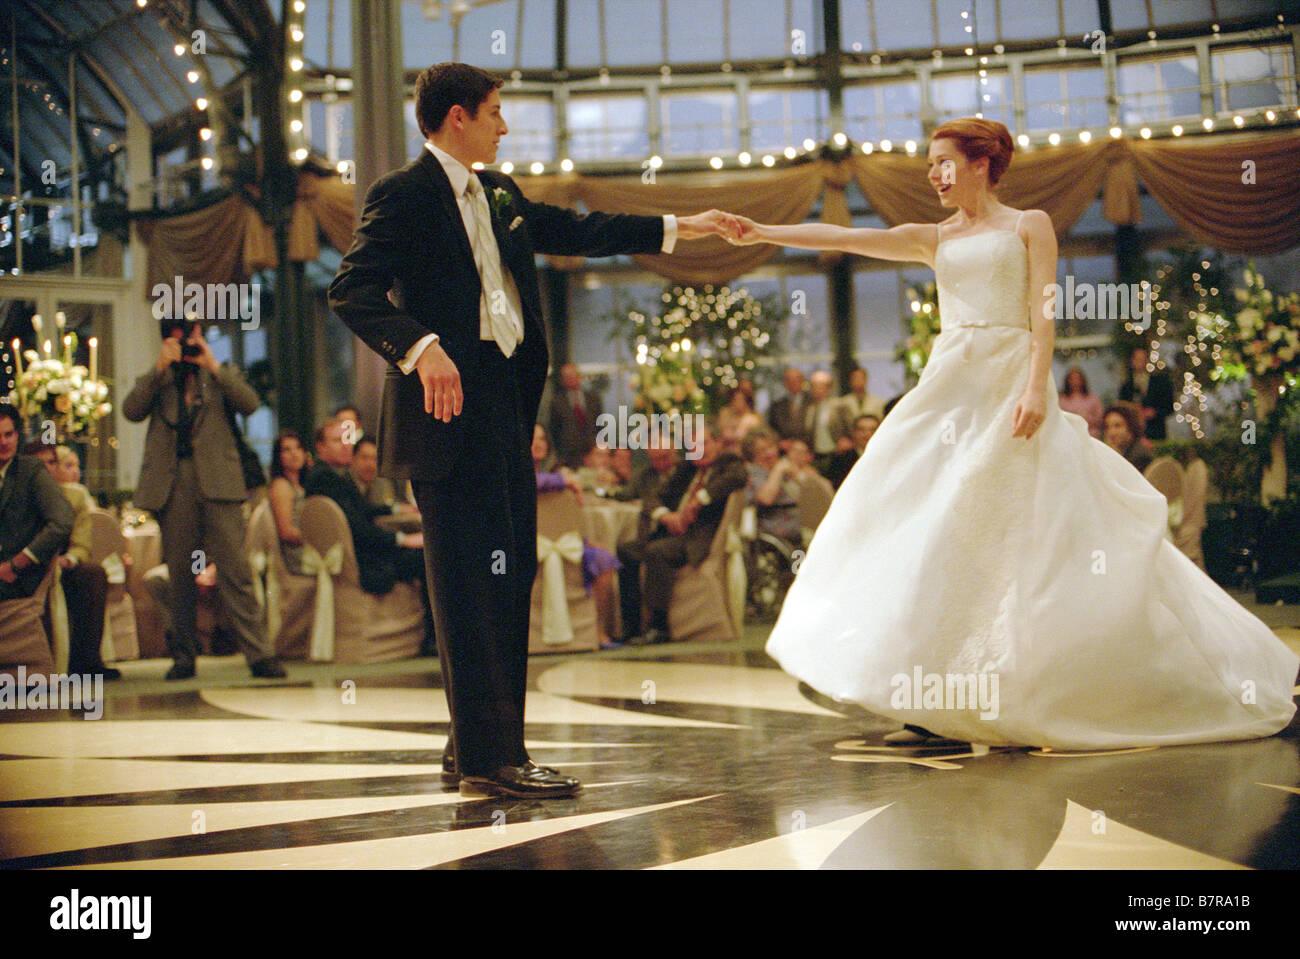 American Wedding  Year: 2003 USA  Jason Biggs, Alyson Hannigan  Directed by Jesse Dylan - Stock Image